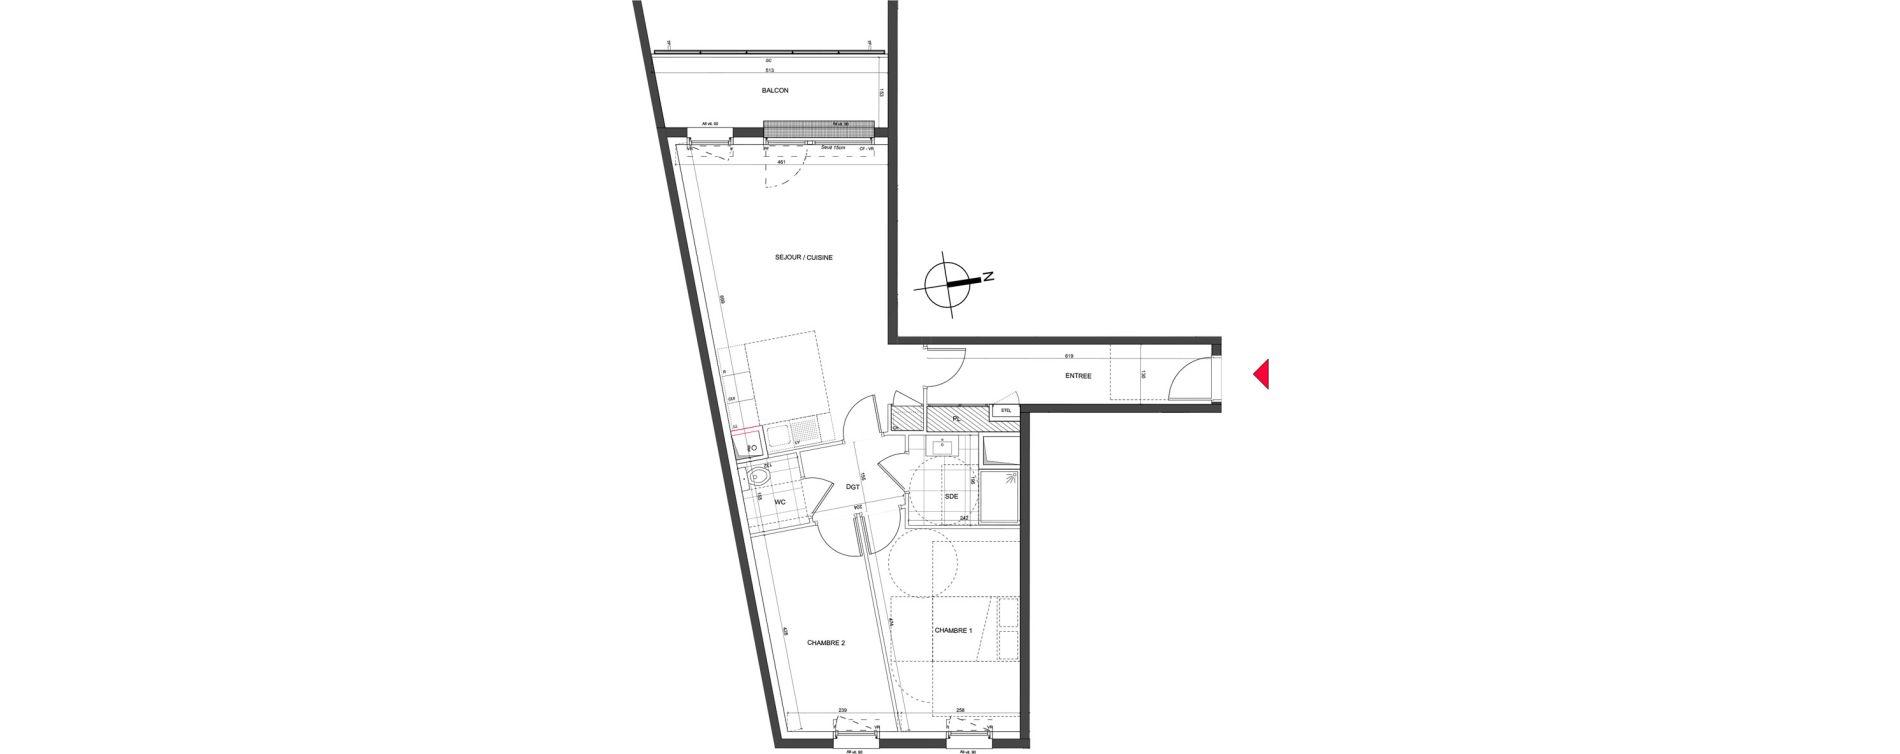 Appartement T3 de 64,33 m2 à Nancy Charles iii